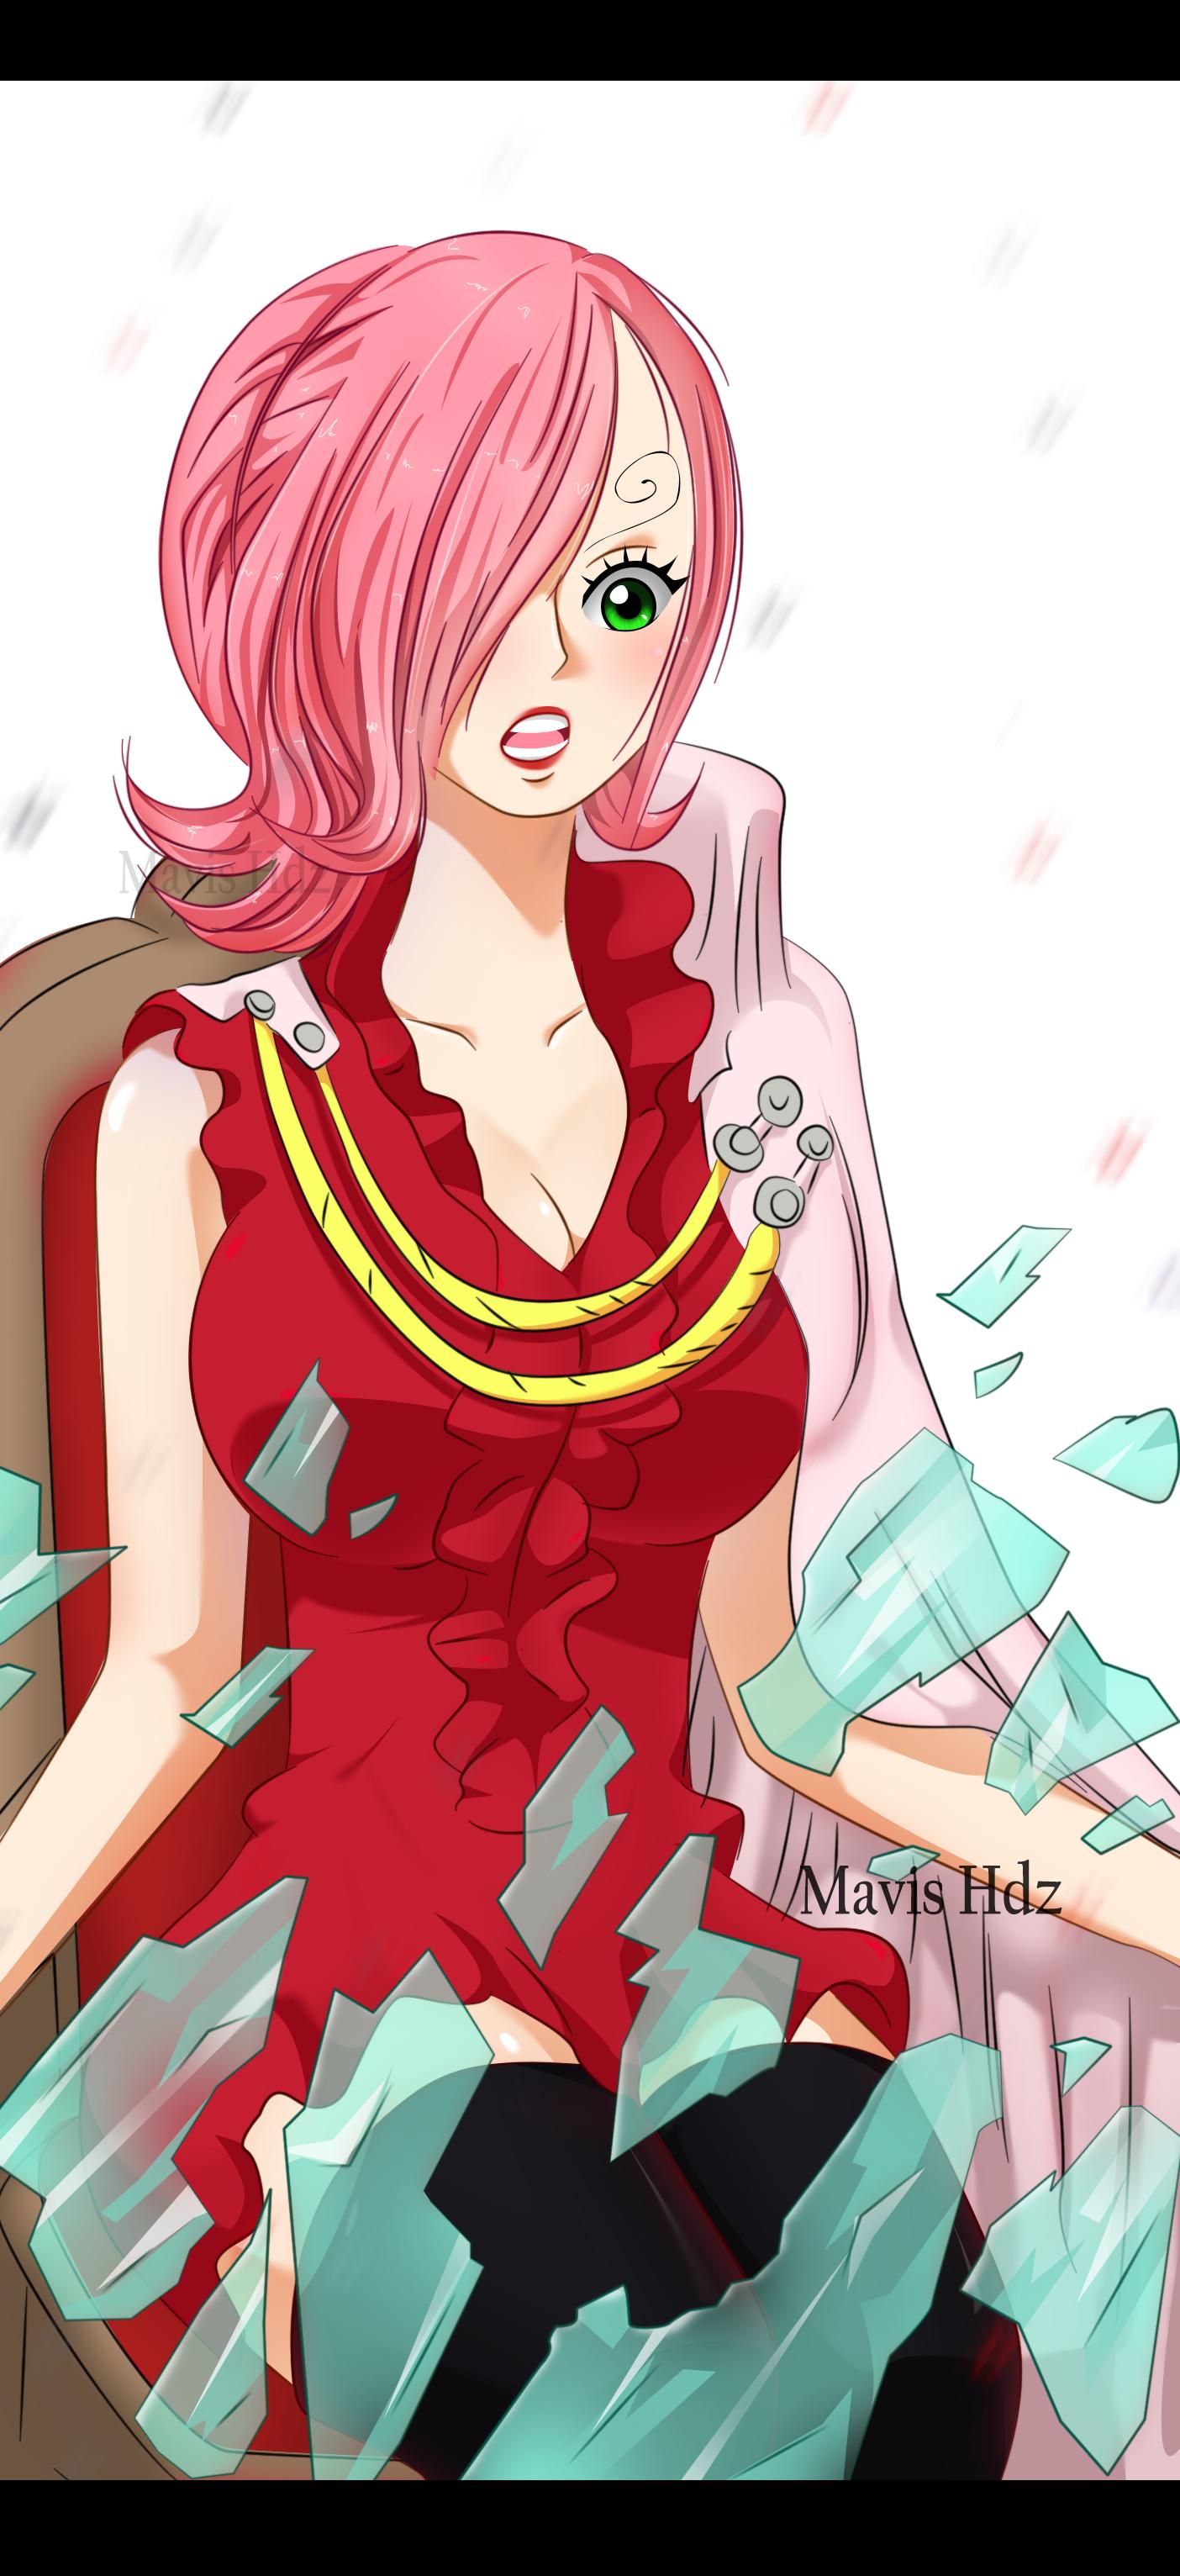 One Piece 865-Reiju by MavisHdz on DeviantArt